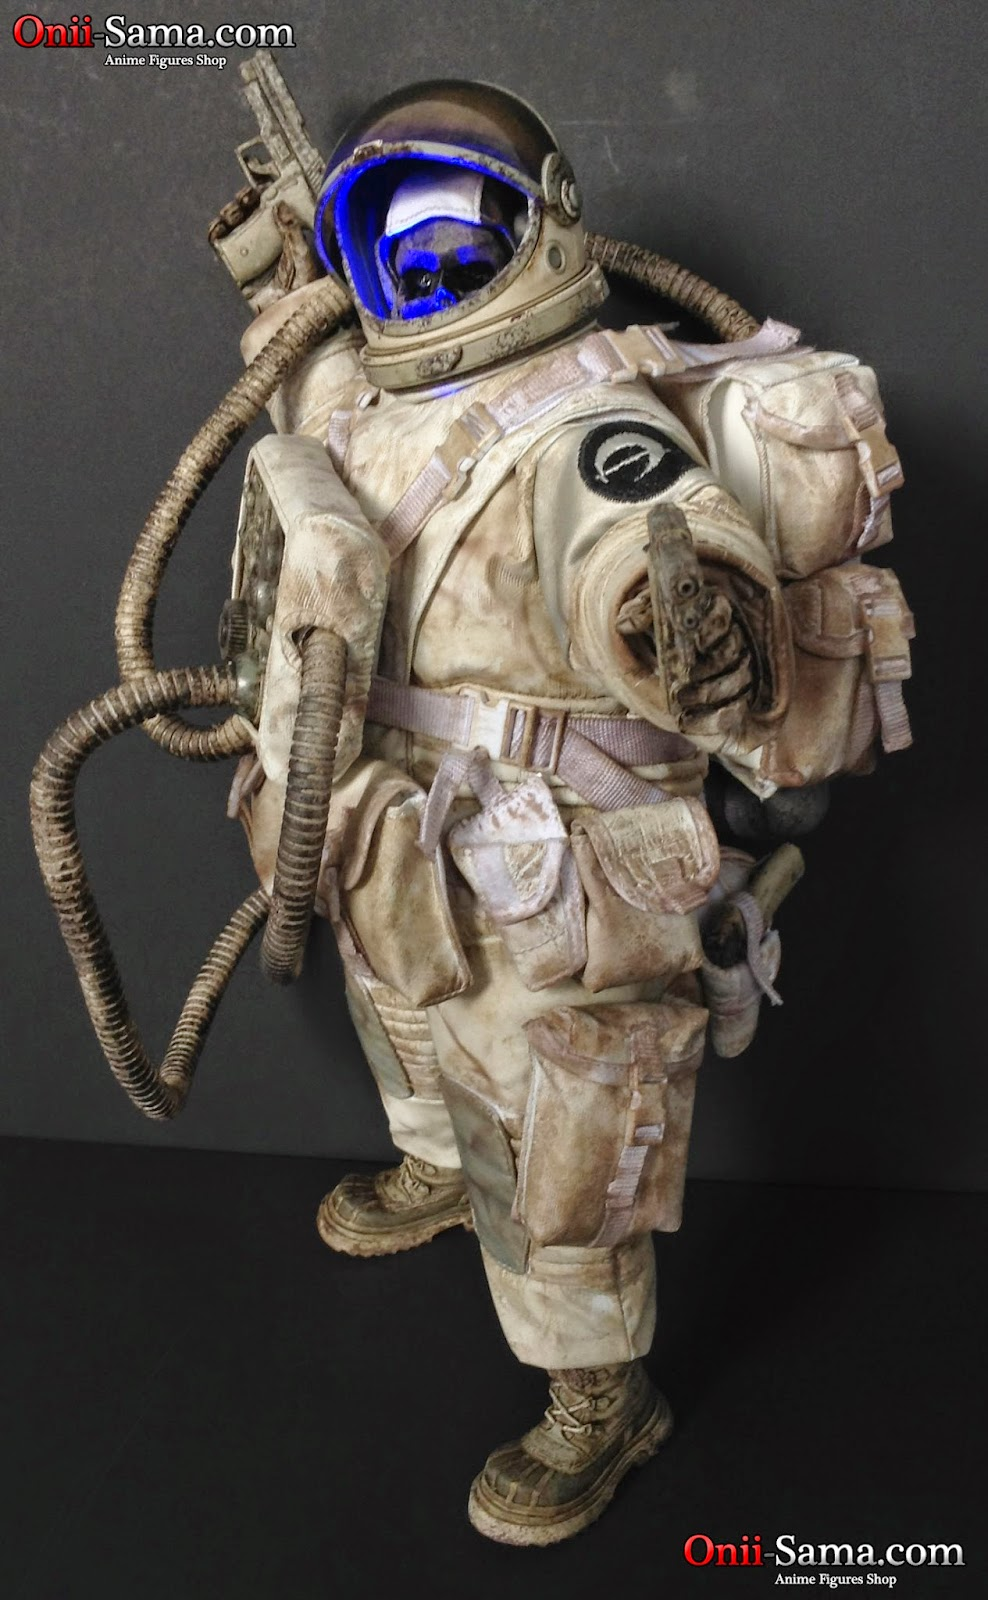 astronaut statue spokane-#25